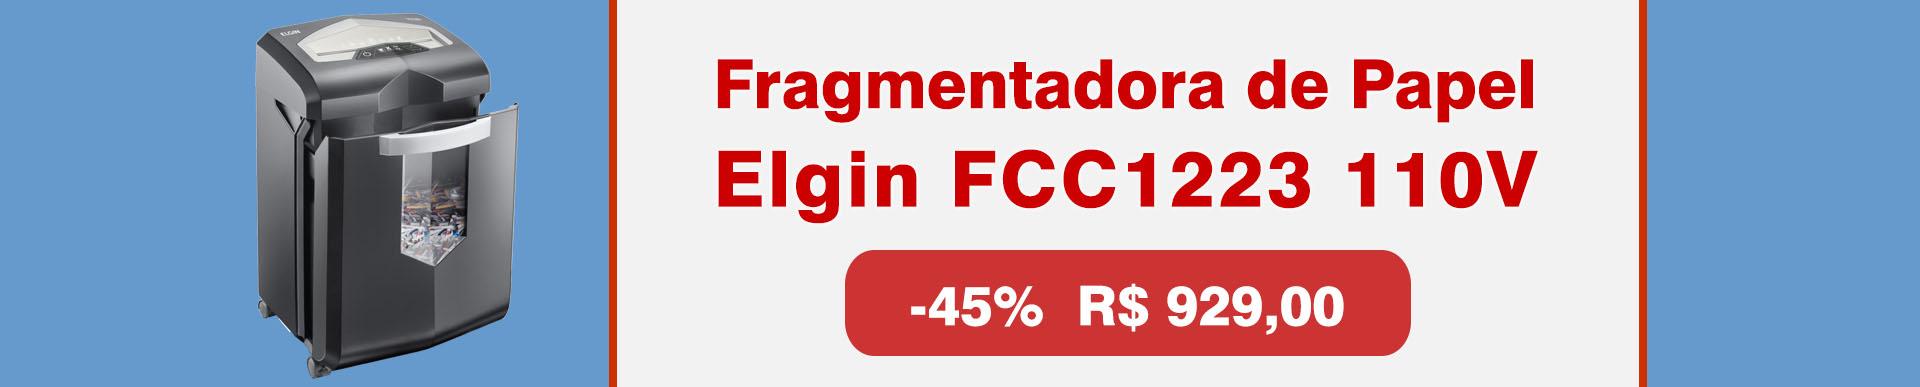 Fragmentadora Elgin FCC1223